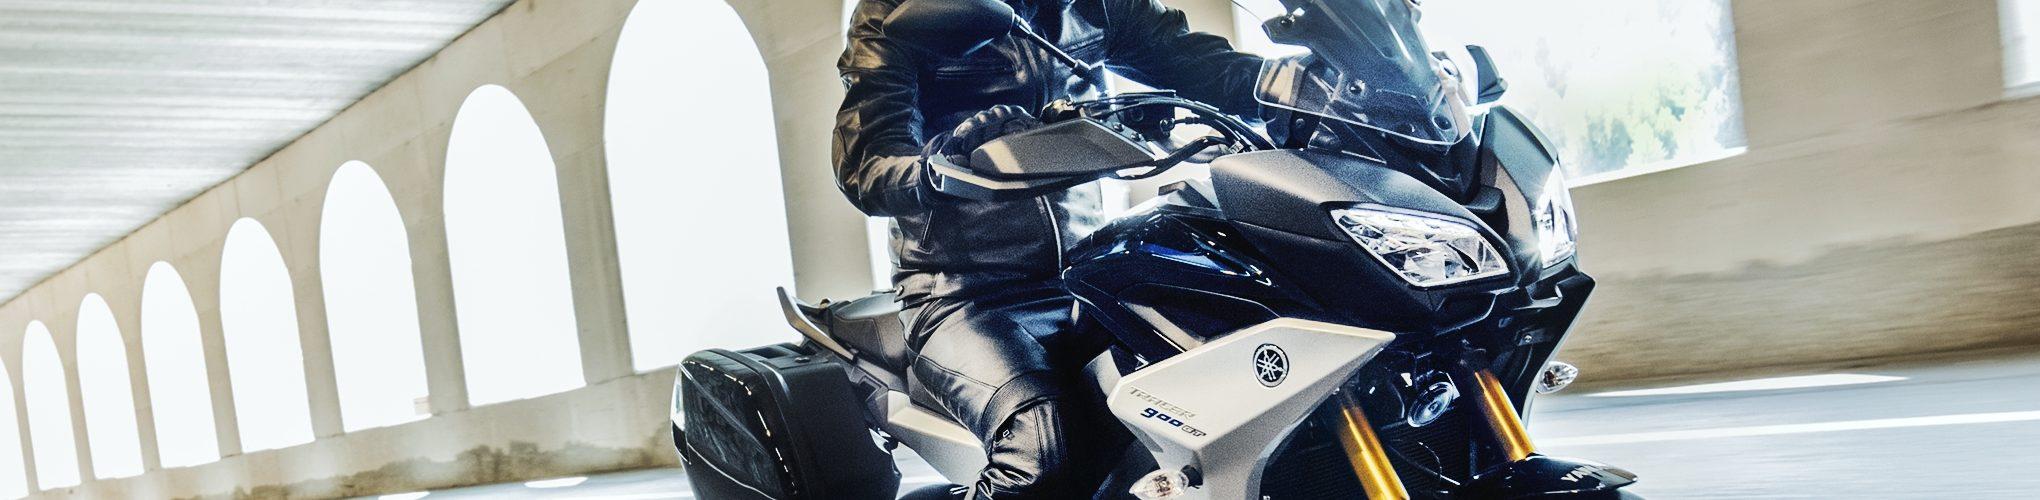 Yamaha MT-09 Tracer GT | MotorCentrumWest lease